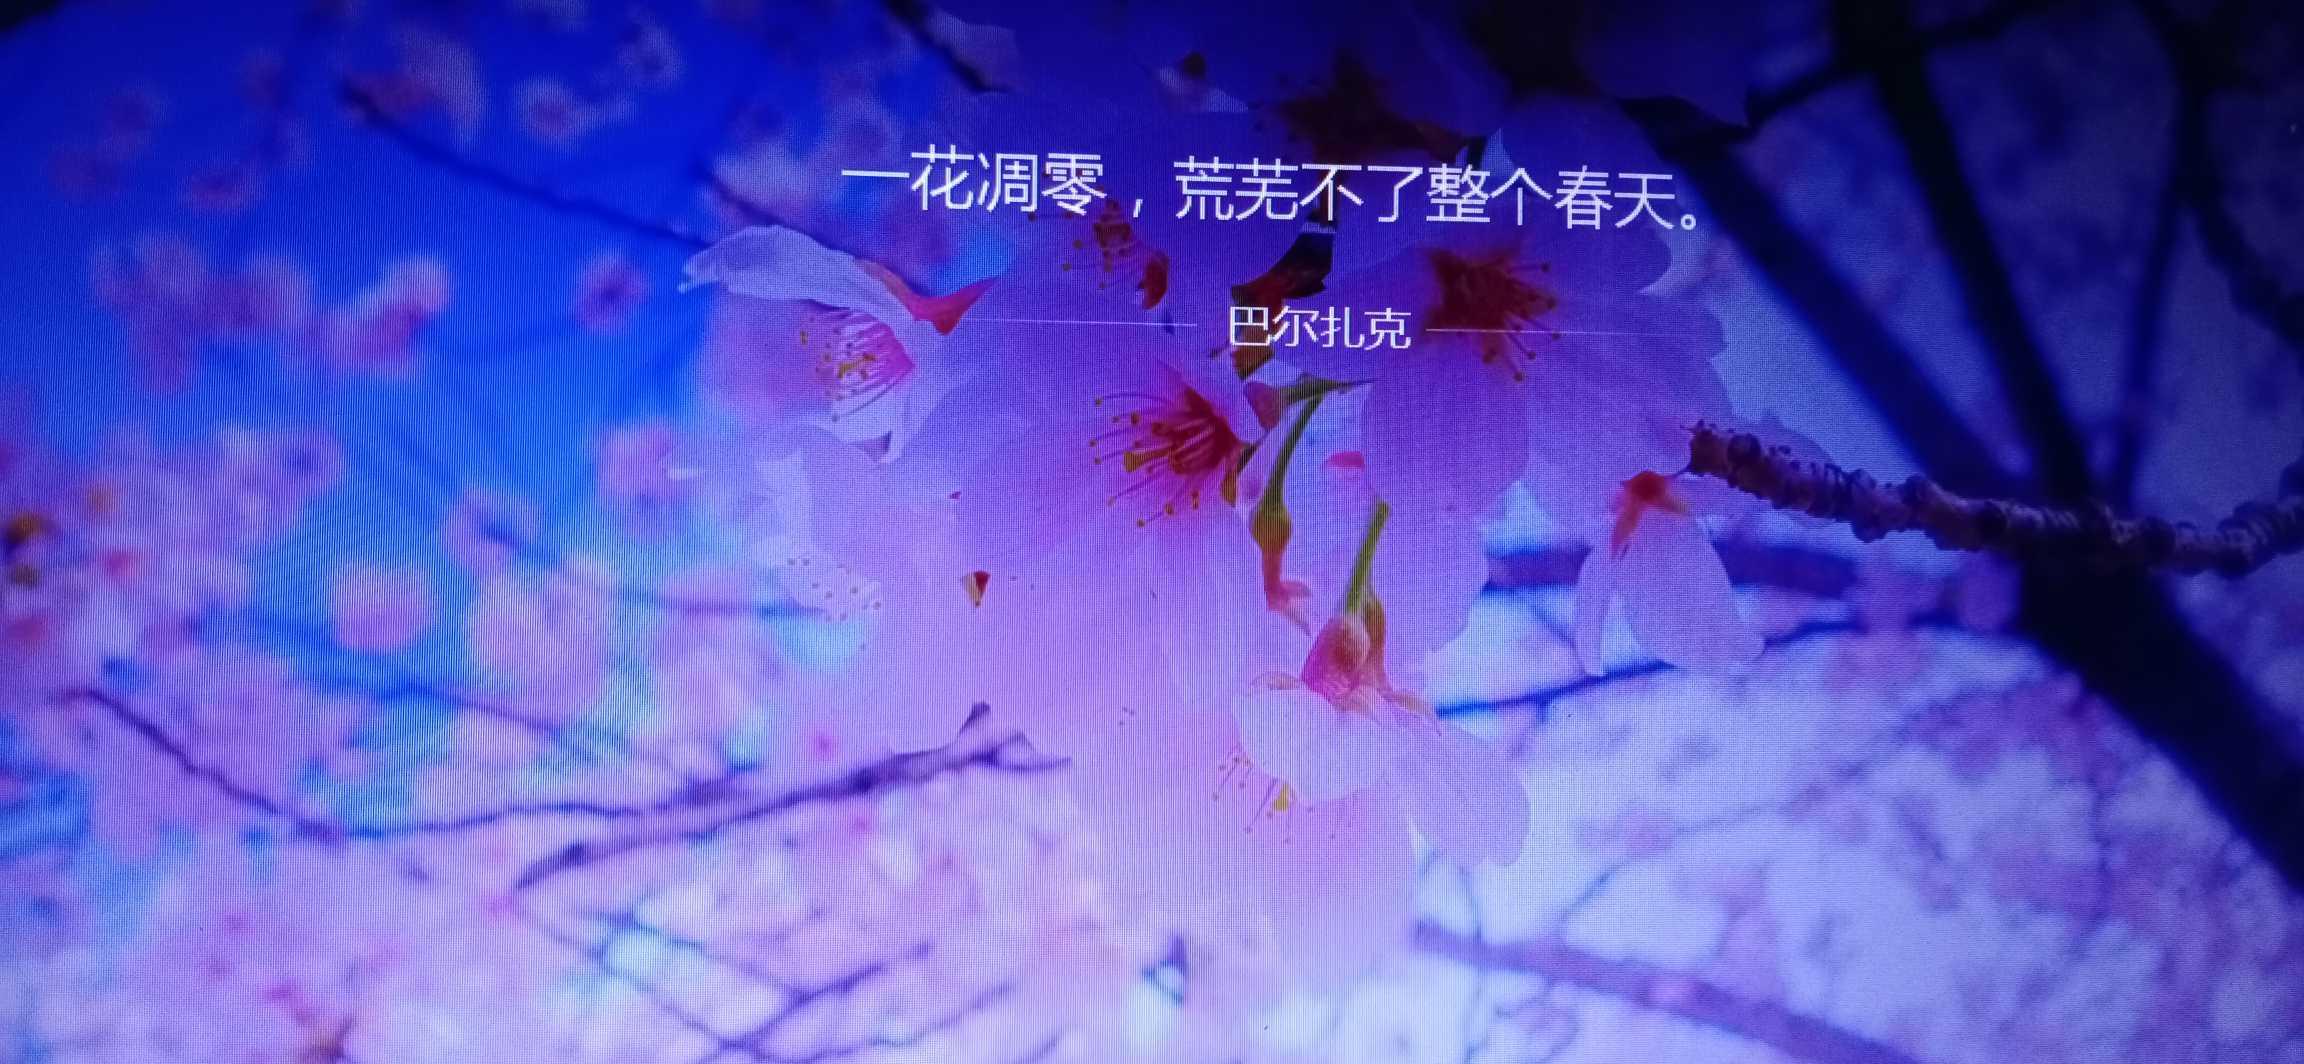 http://www.58100.com/pid/702253.html